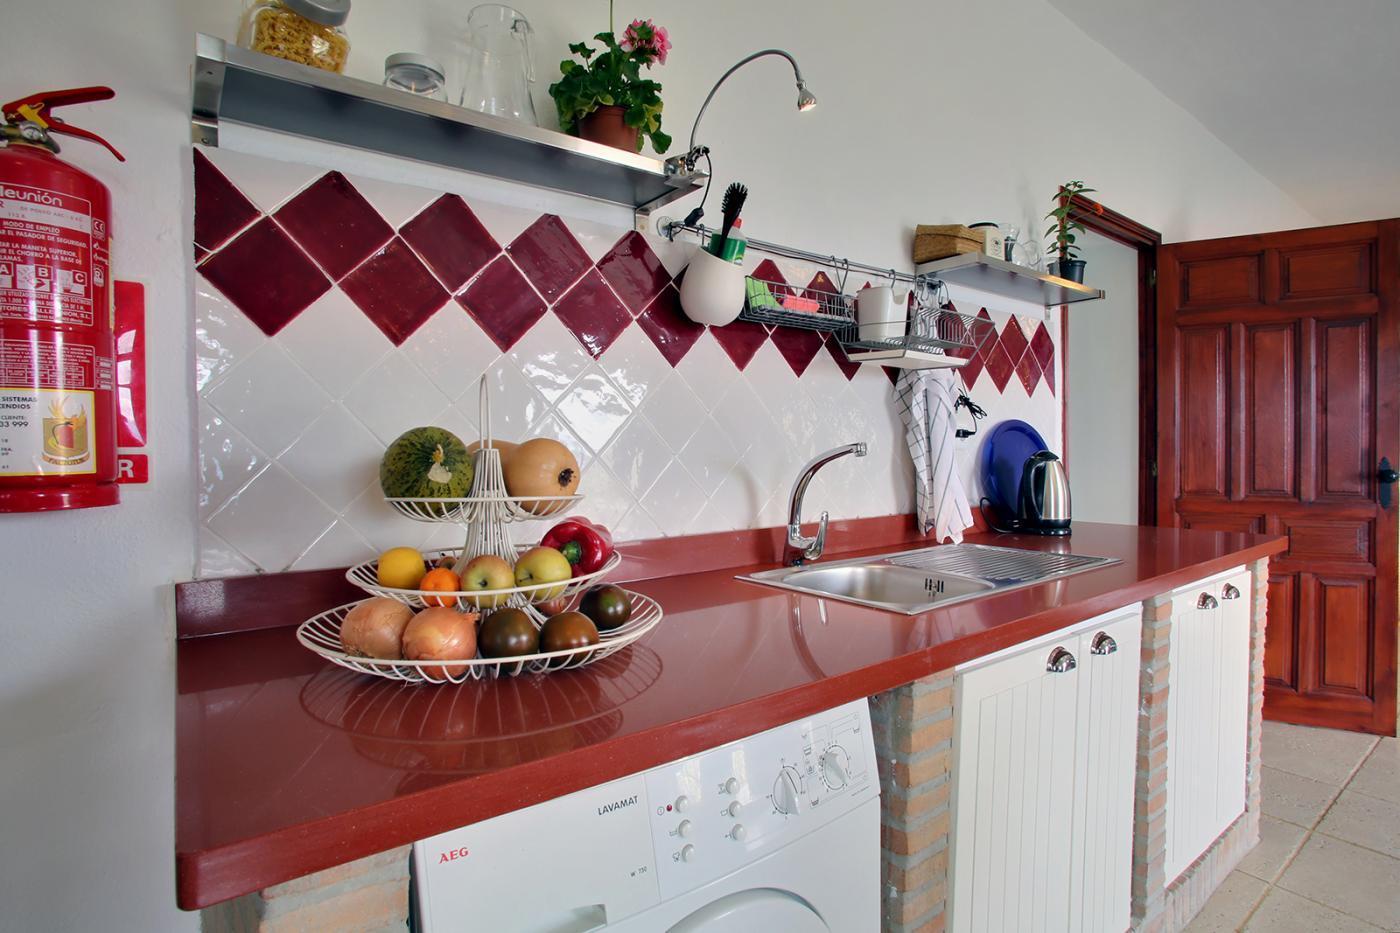 5 Bedroom Rural tourism business for Sale in Gaucin